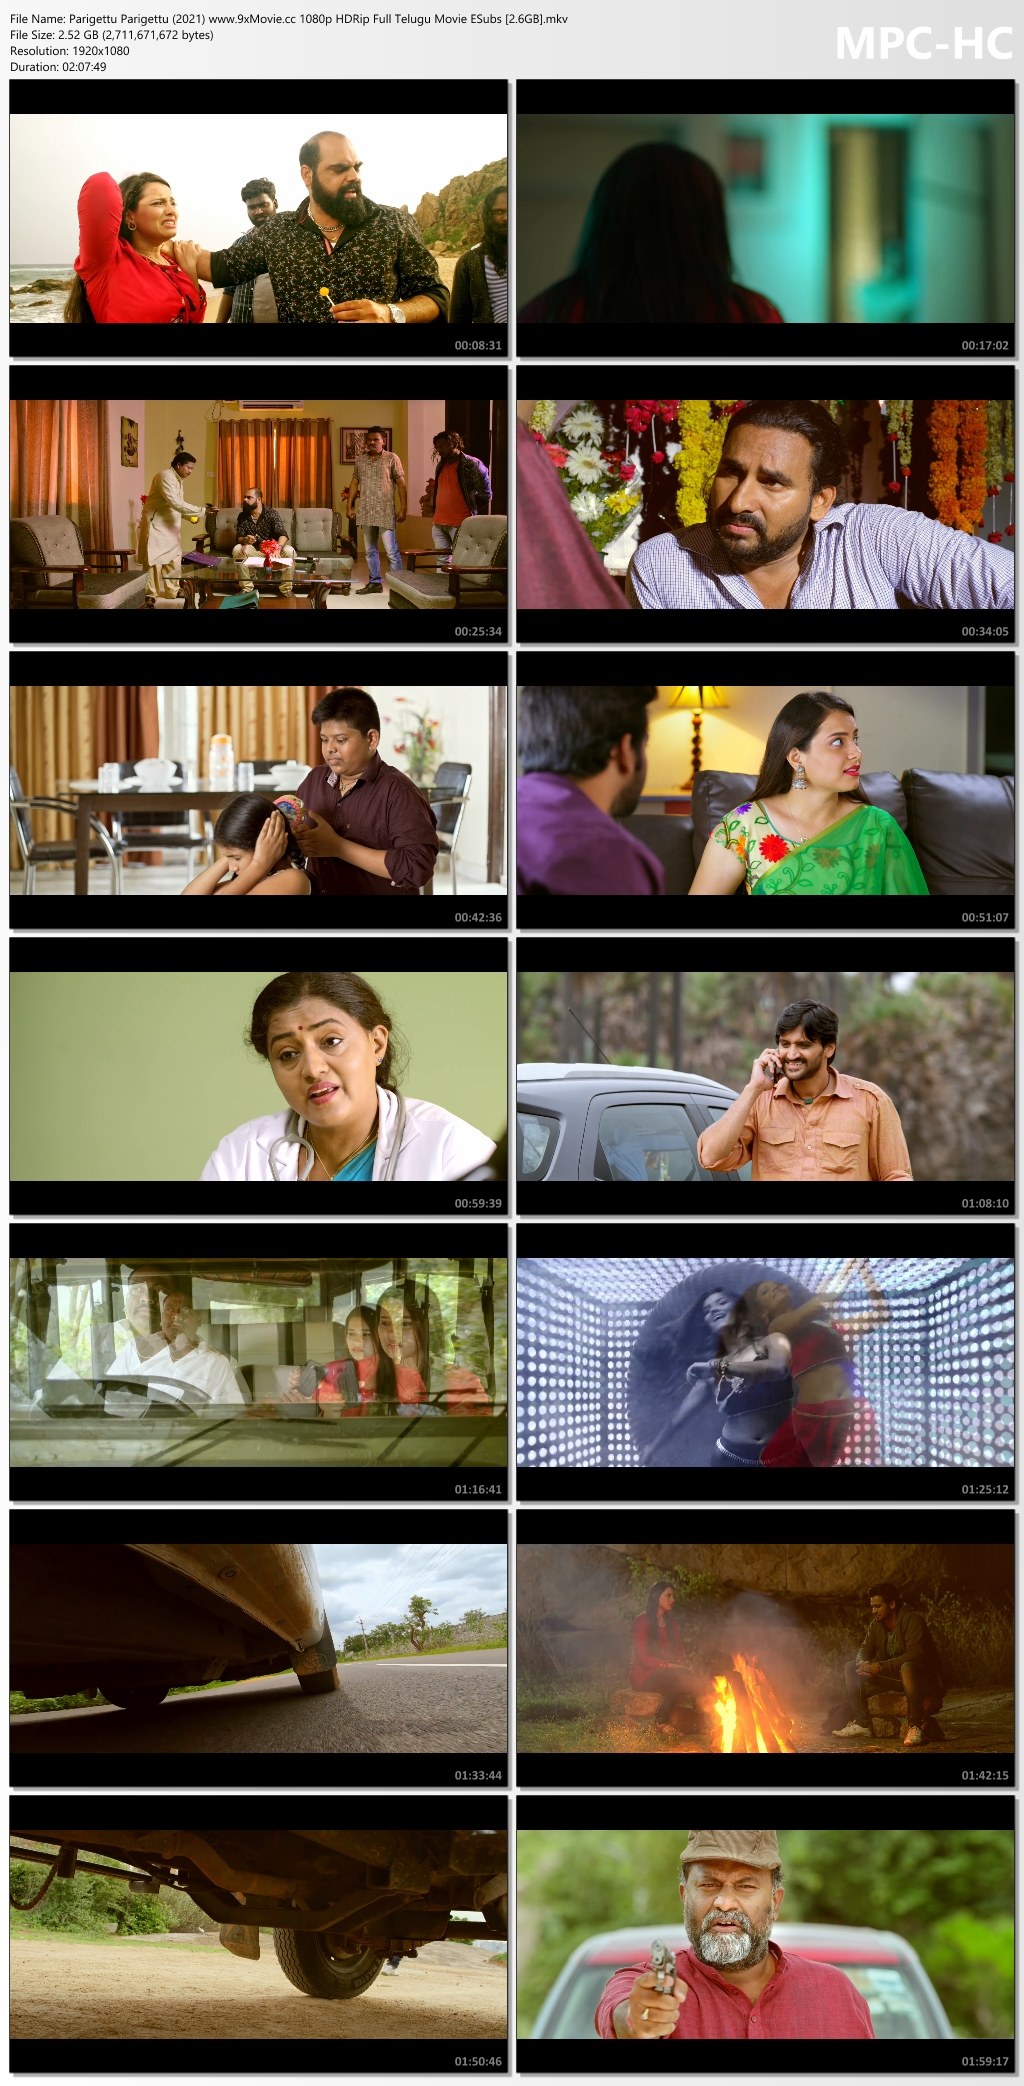 Parigettu-Parigettu-2021-www-9x-Movie-cc-1080p-HDRip-Full-Telugu-Movie-ESubs-2-6-GB-mkv